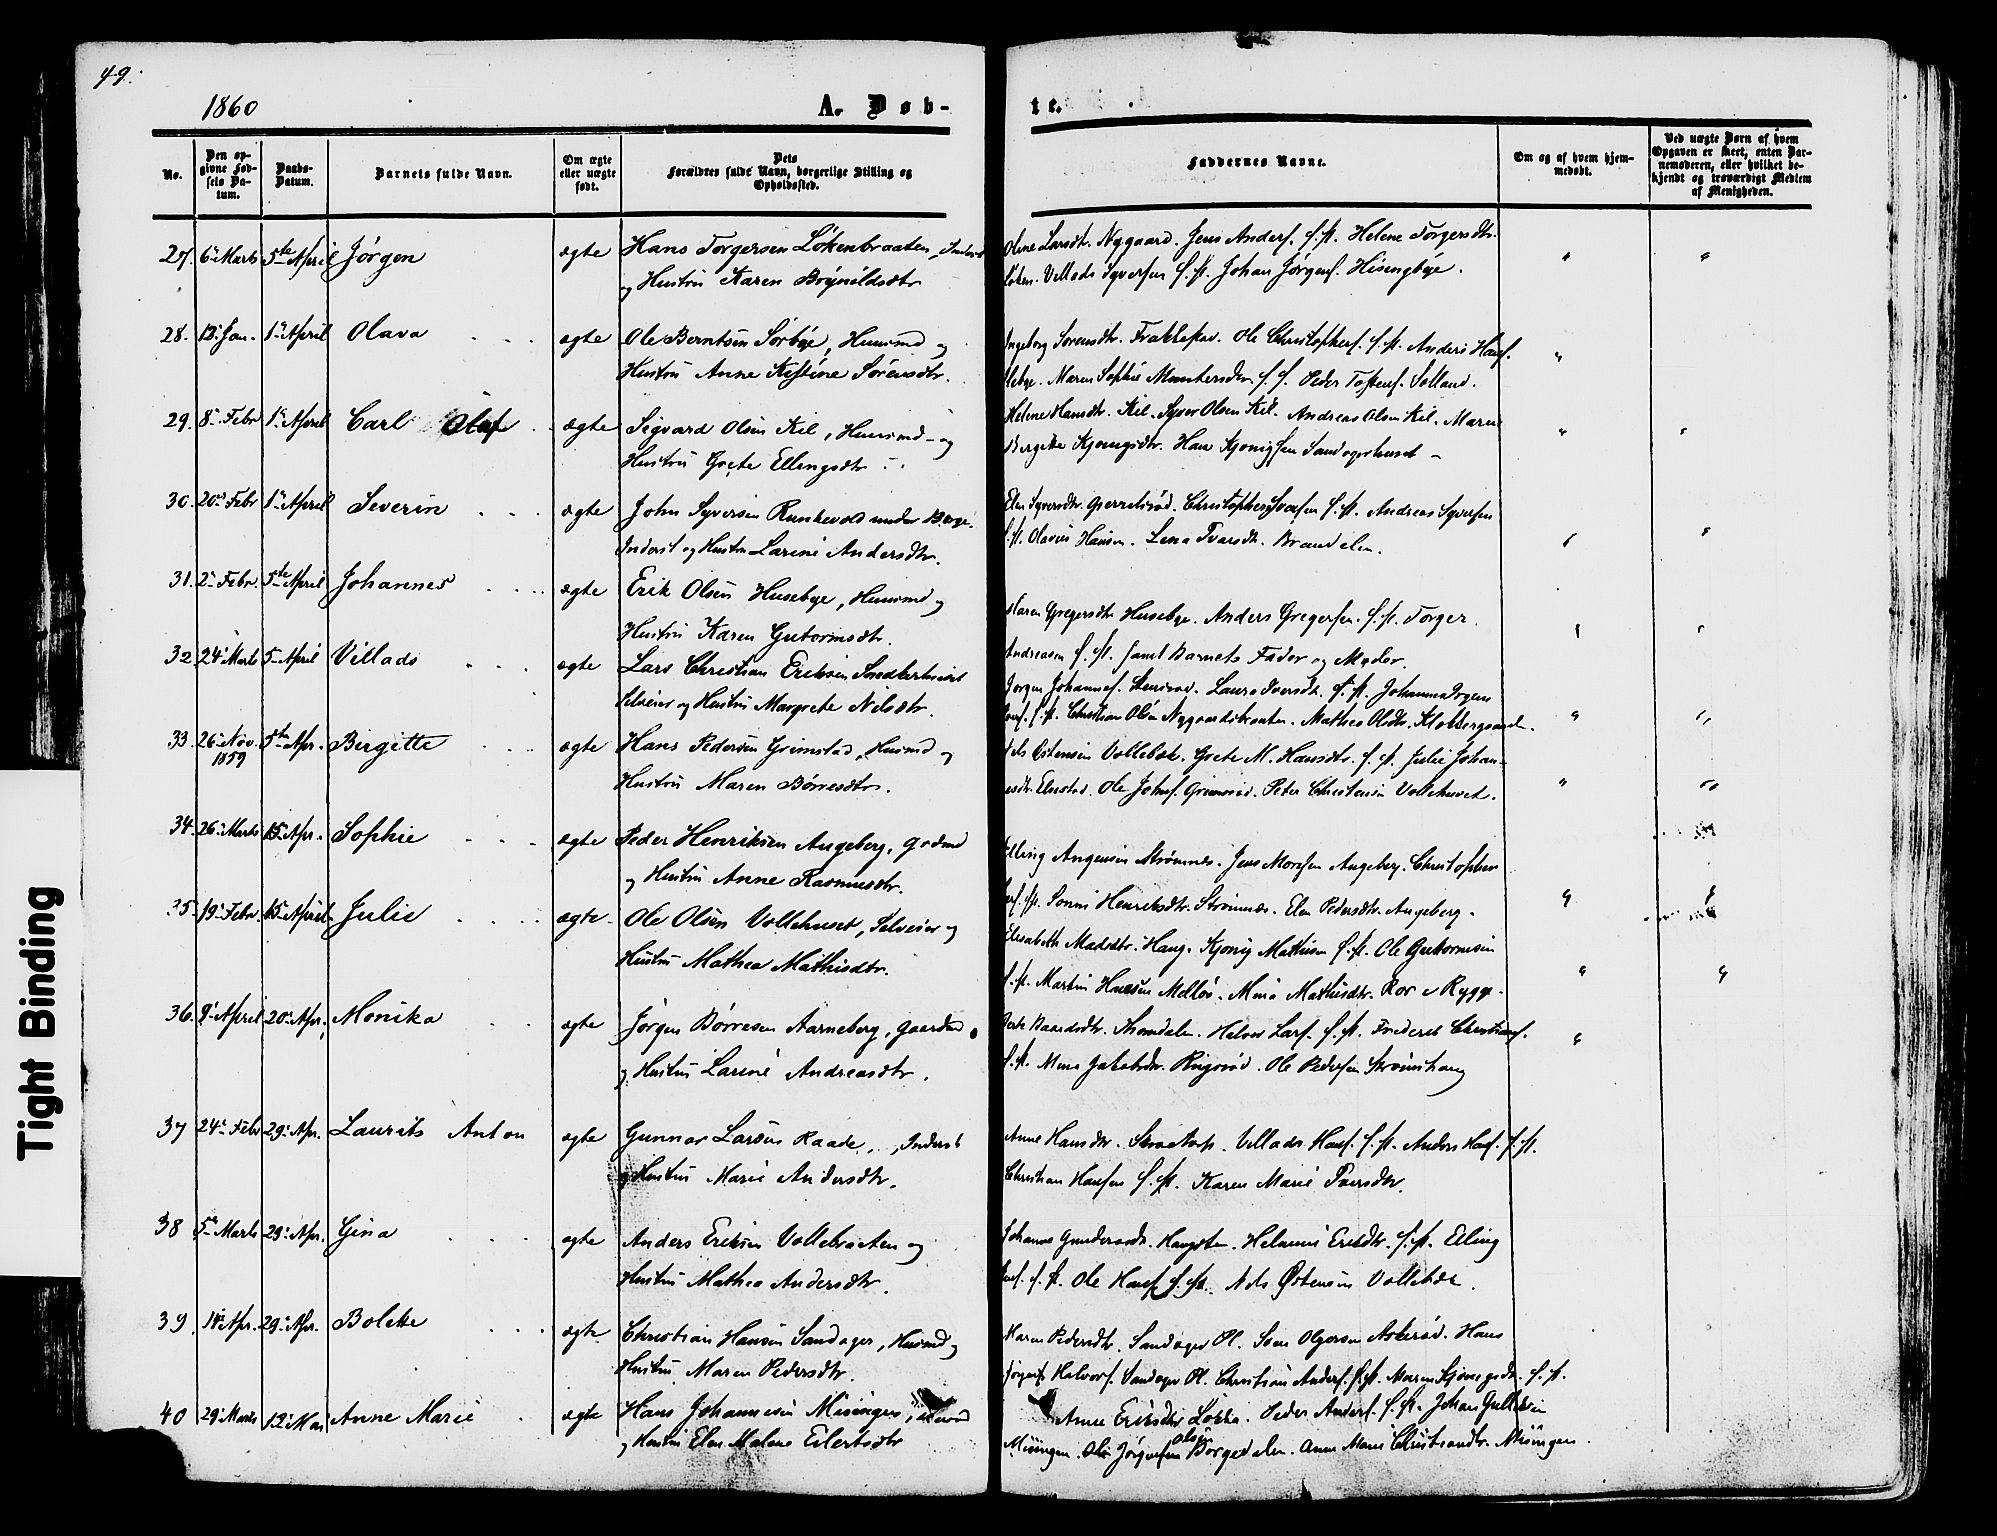 SAO, Råde prestekontor kirkebøker, F/Fa/L0006: Ministerialbok nr. 6, 1854-1877, s. 49